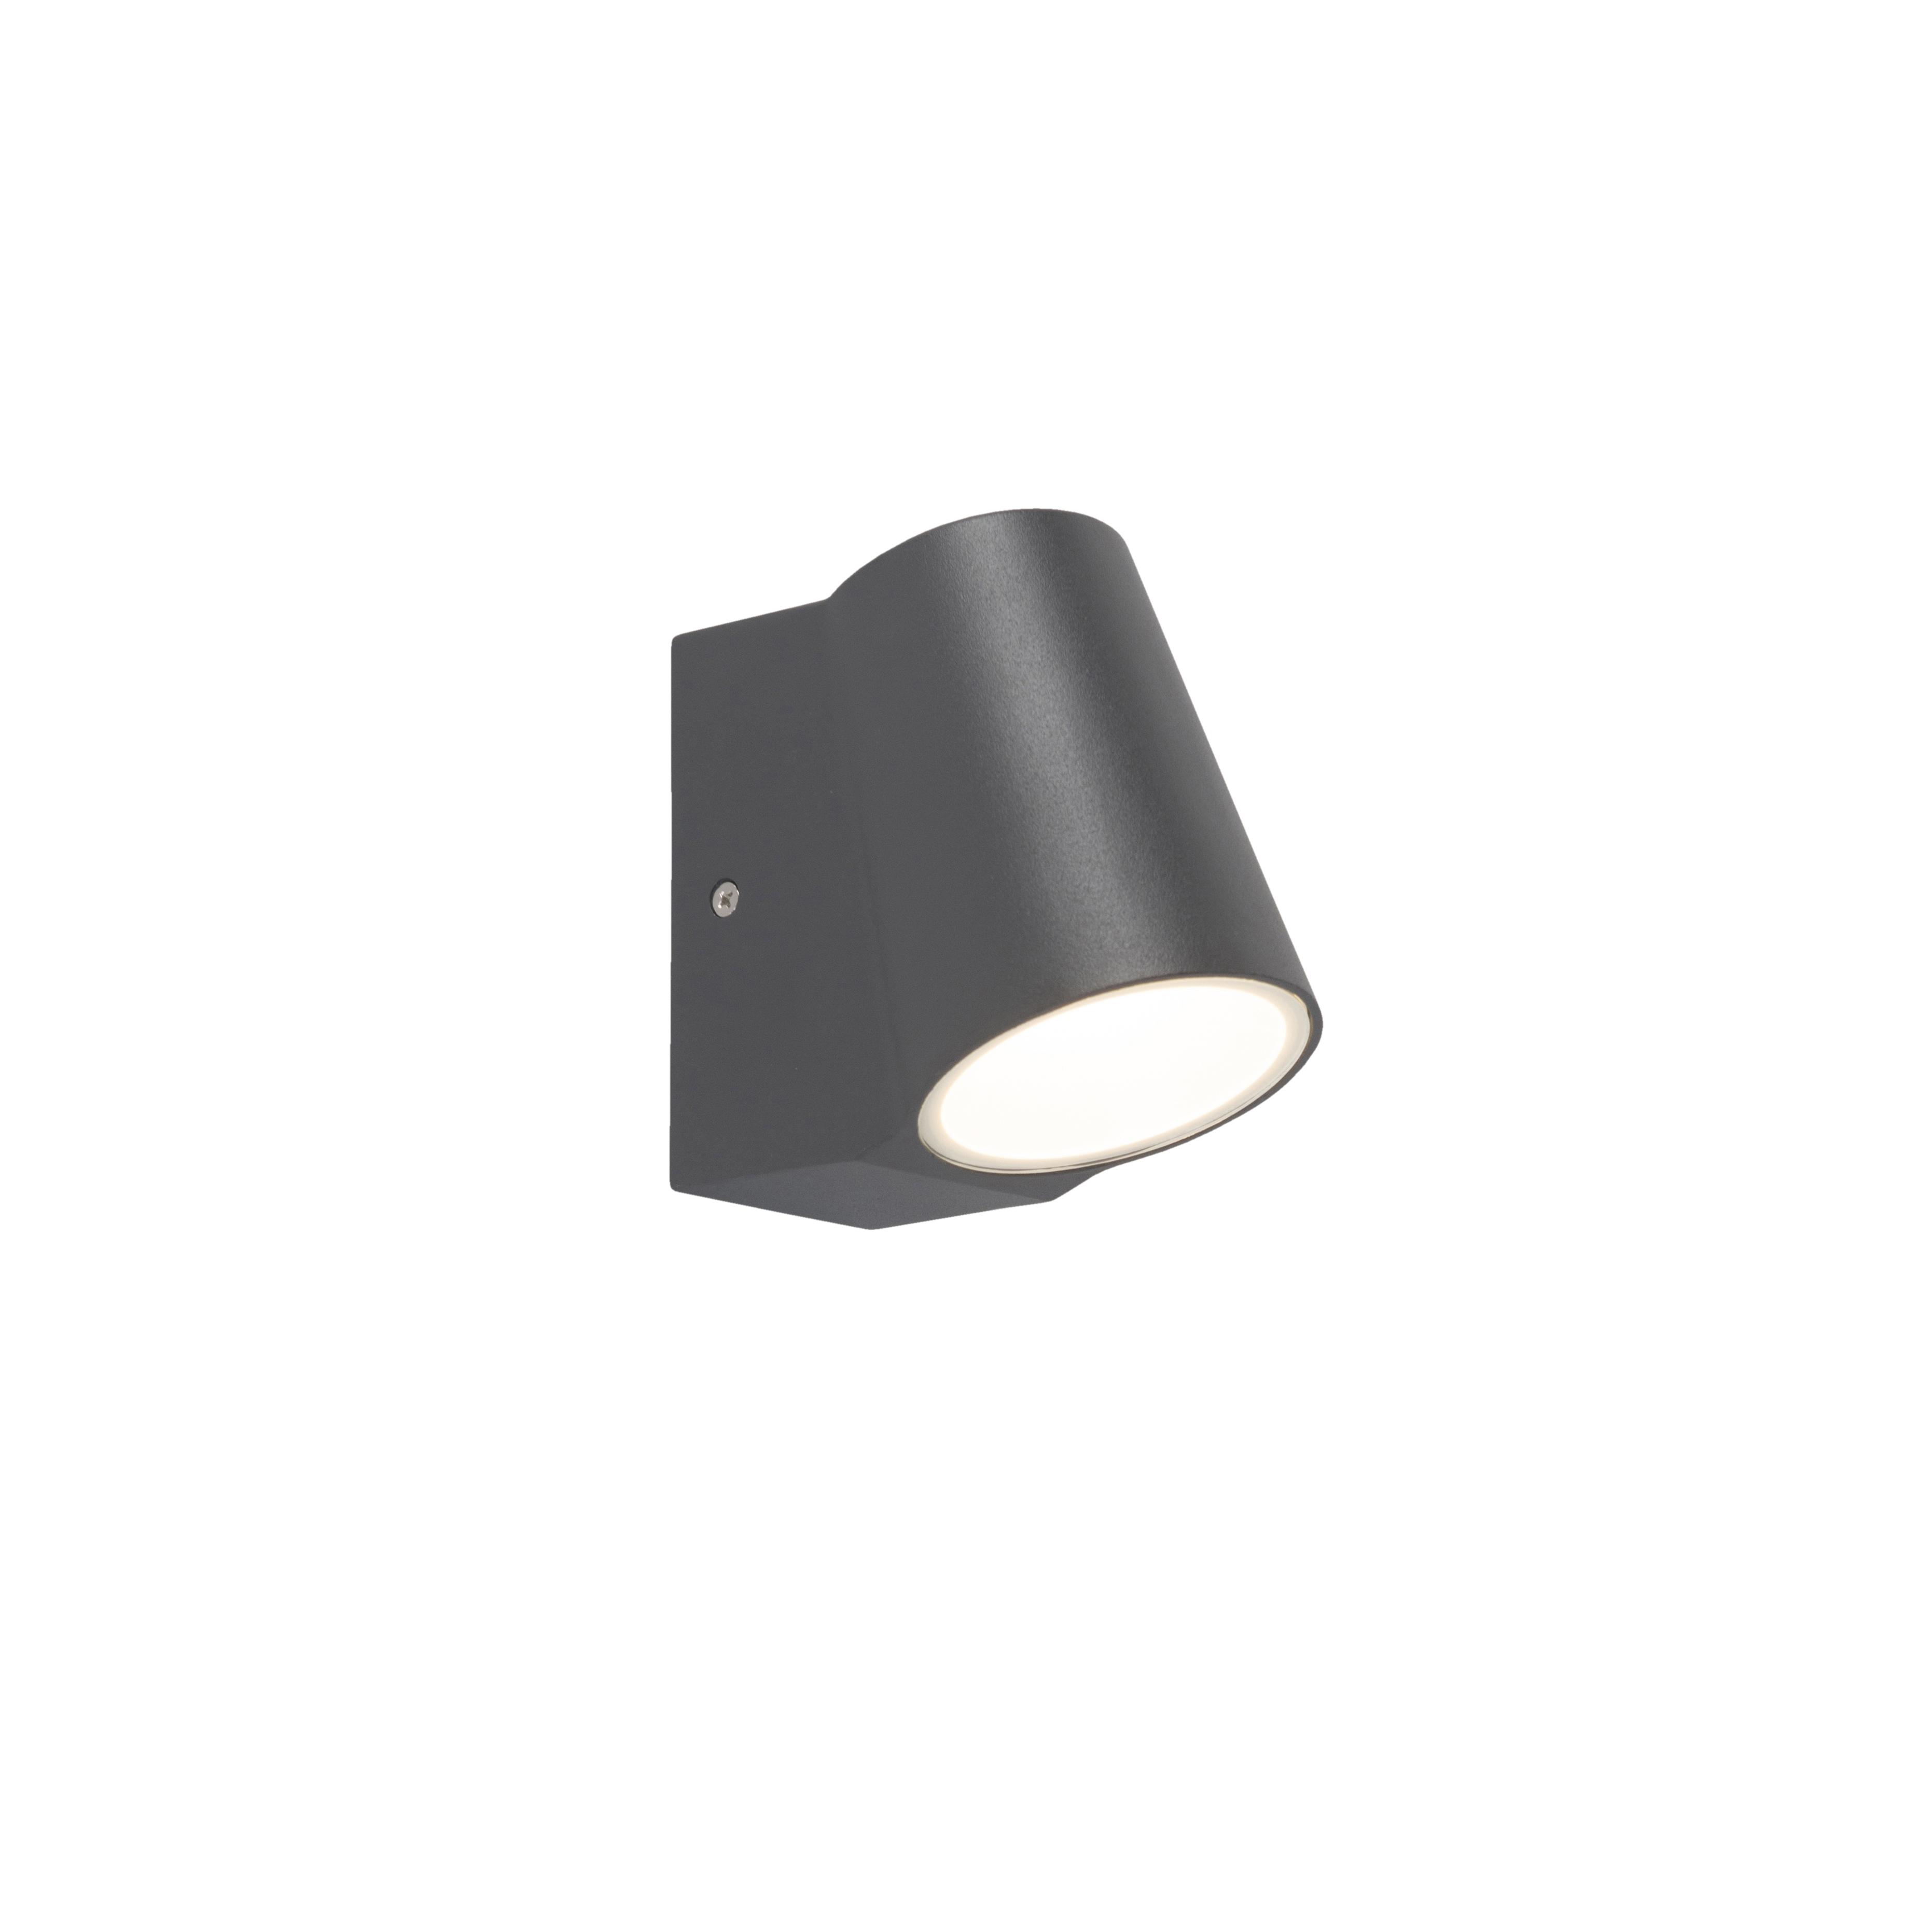 Moderne buitenwandlamp donkergrijs incl. LED - Uma